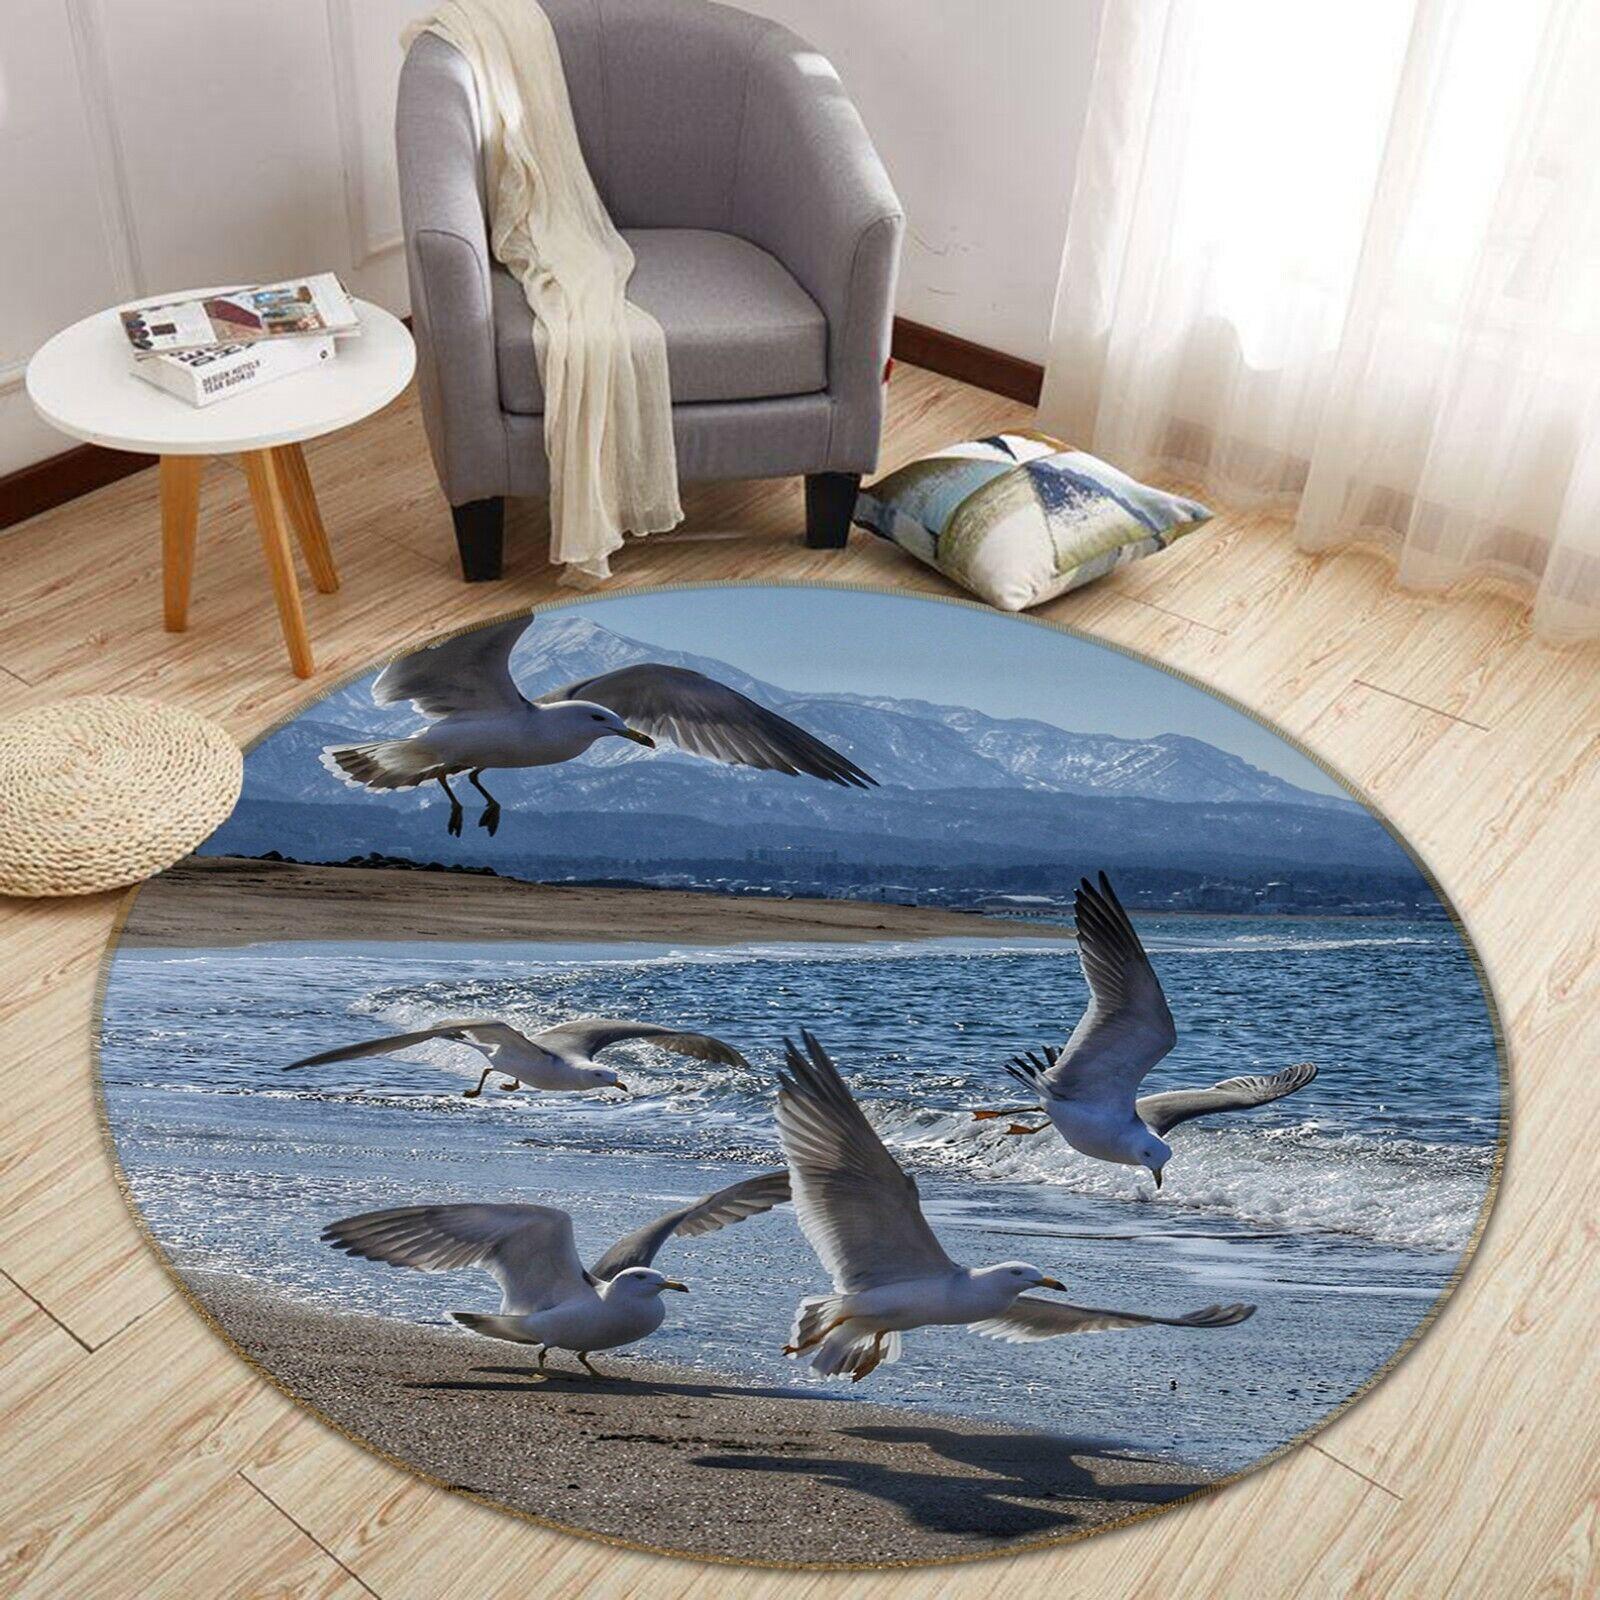 3D SEA BEACH Bird B16 Animale tappetino antiscivolo tappeto rossoondo elegante Tappeto Wendy